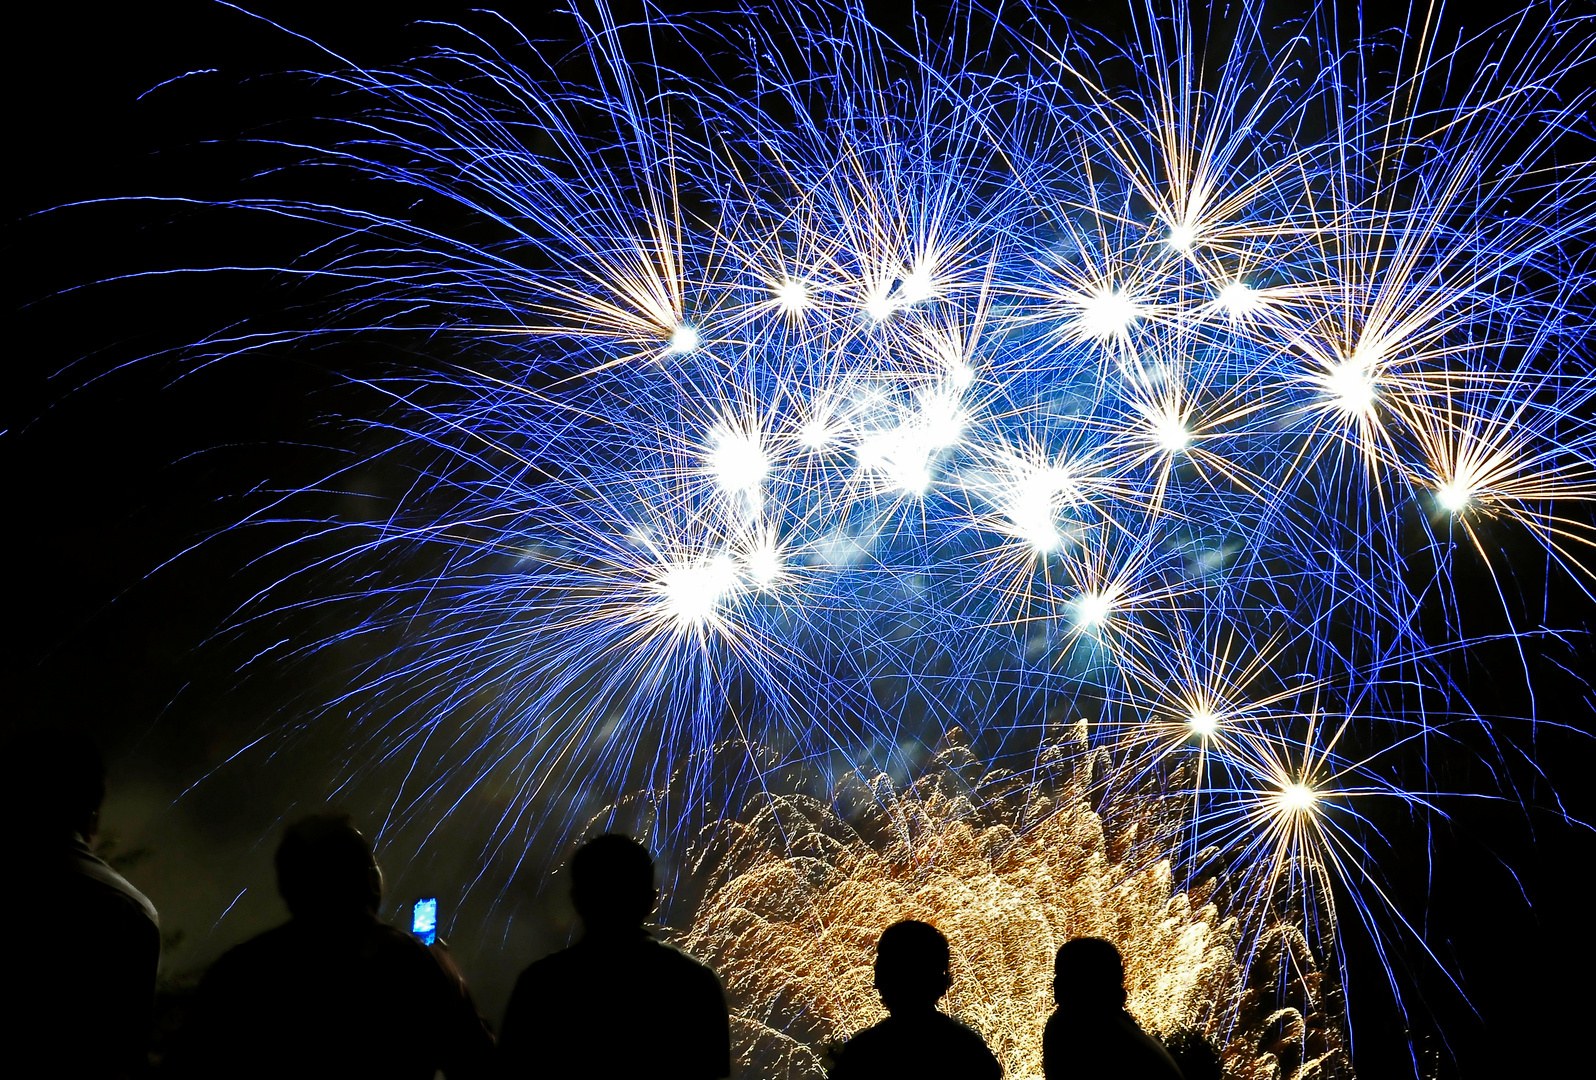 DR_Fireworks2.JPG